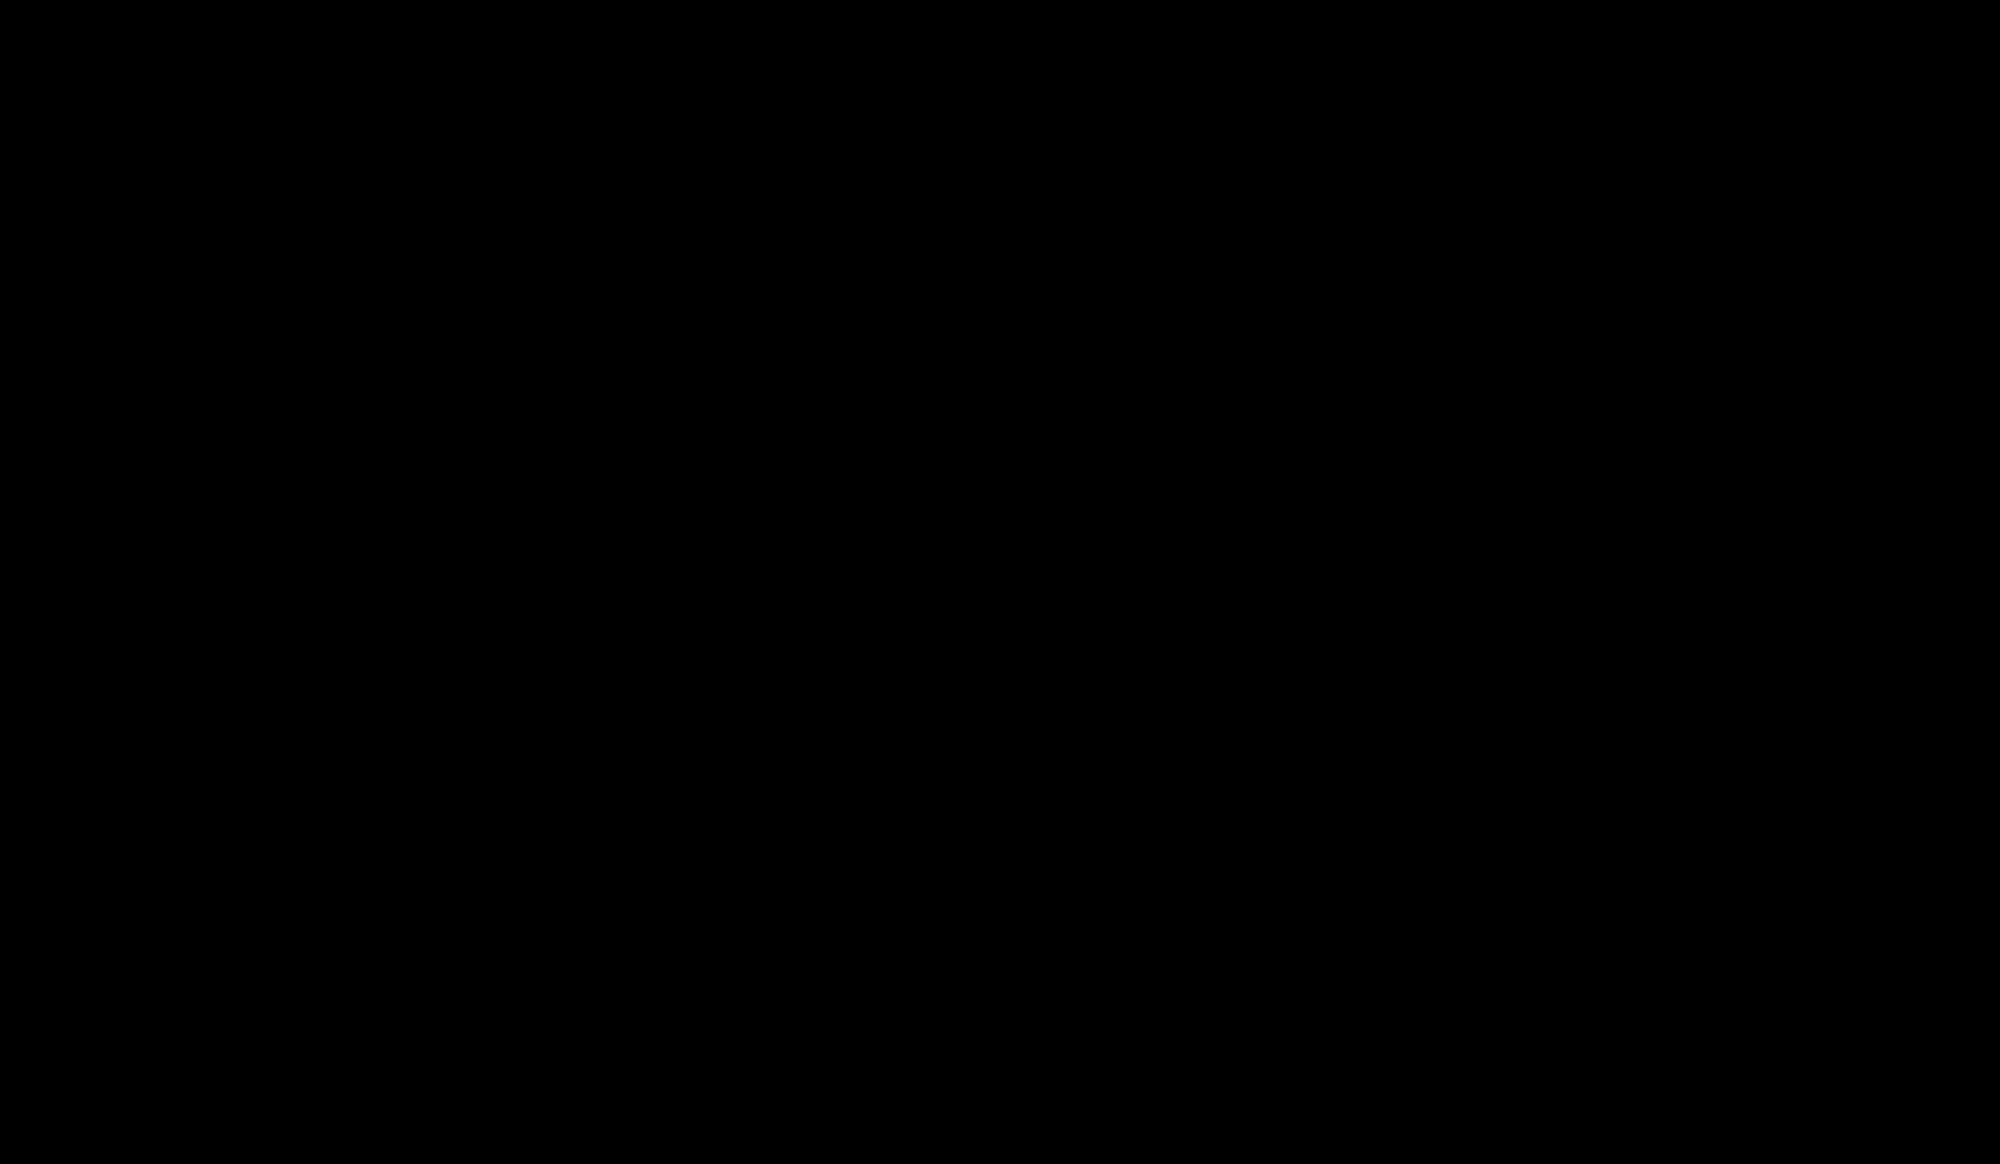 Tetrahydrocannabinolicacid